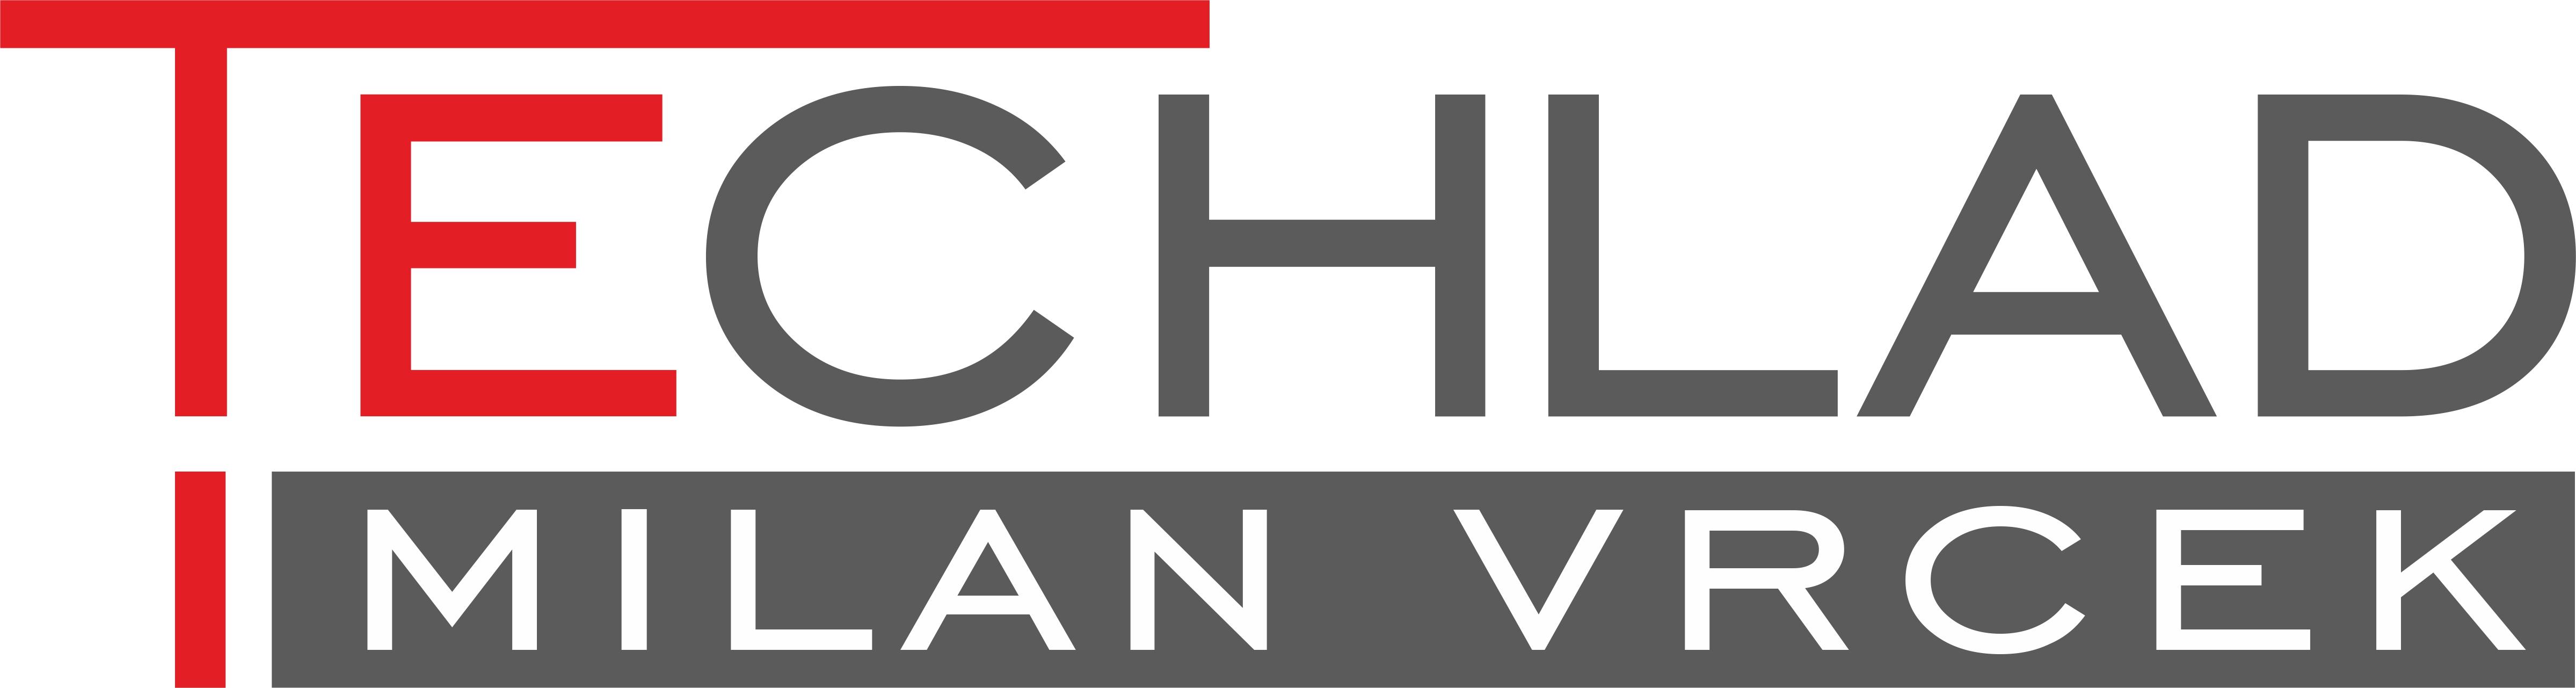 Milan Vrcek -Techlad